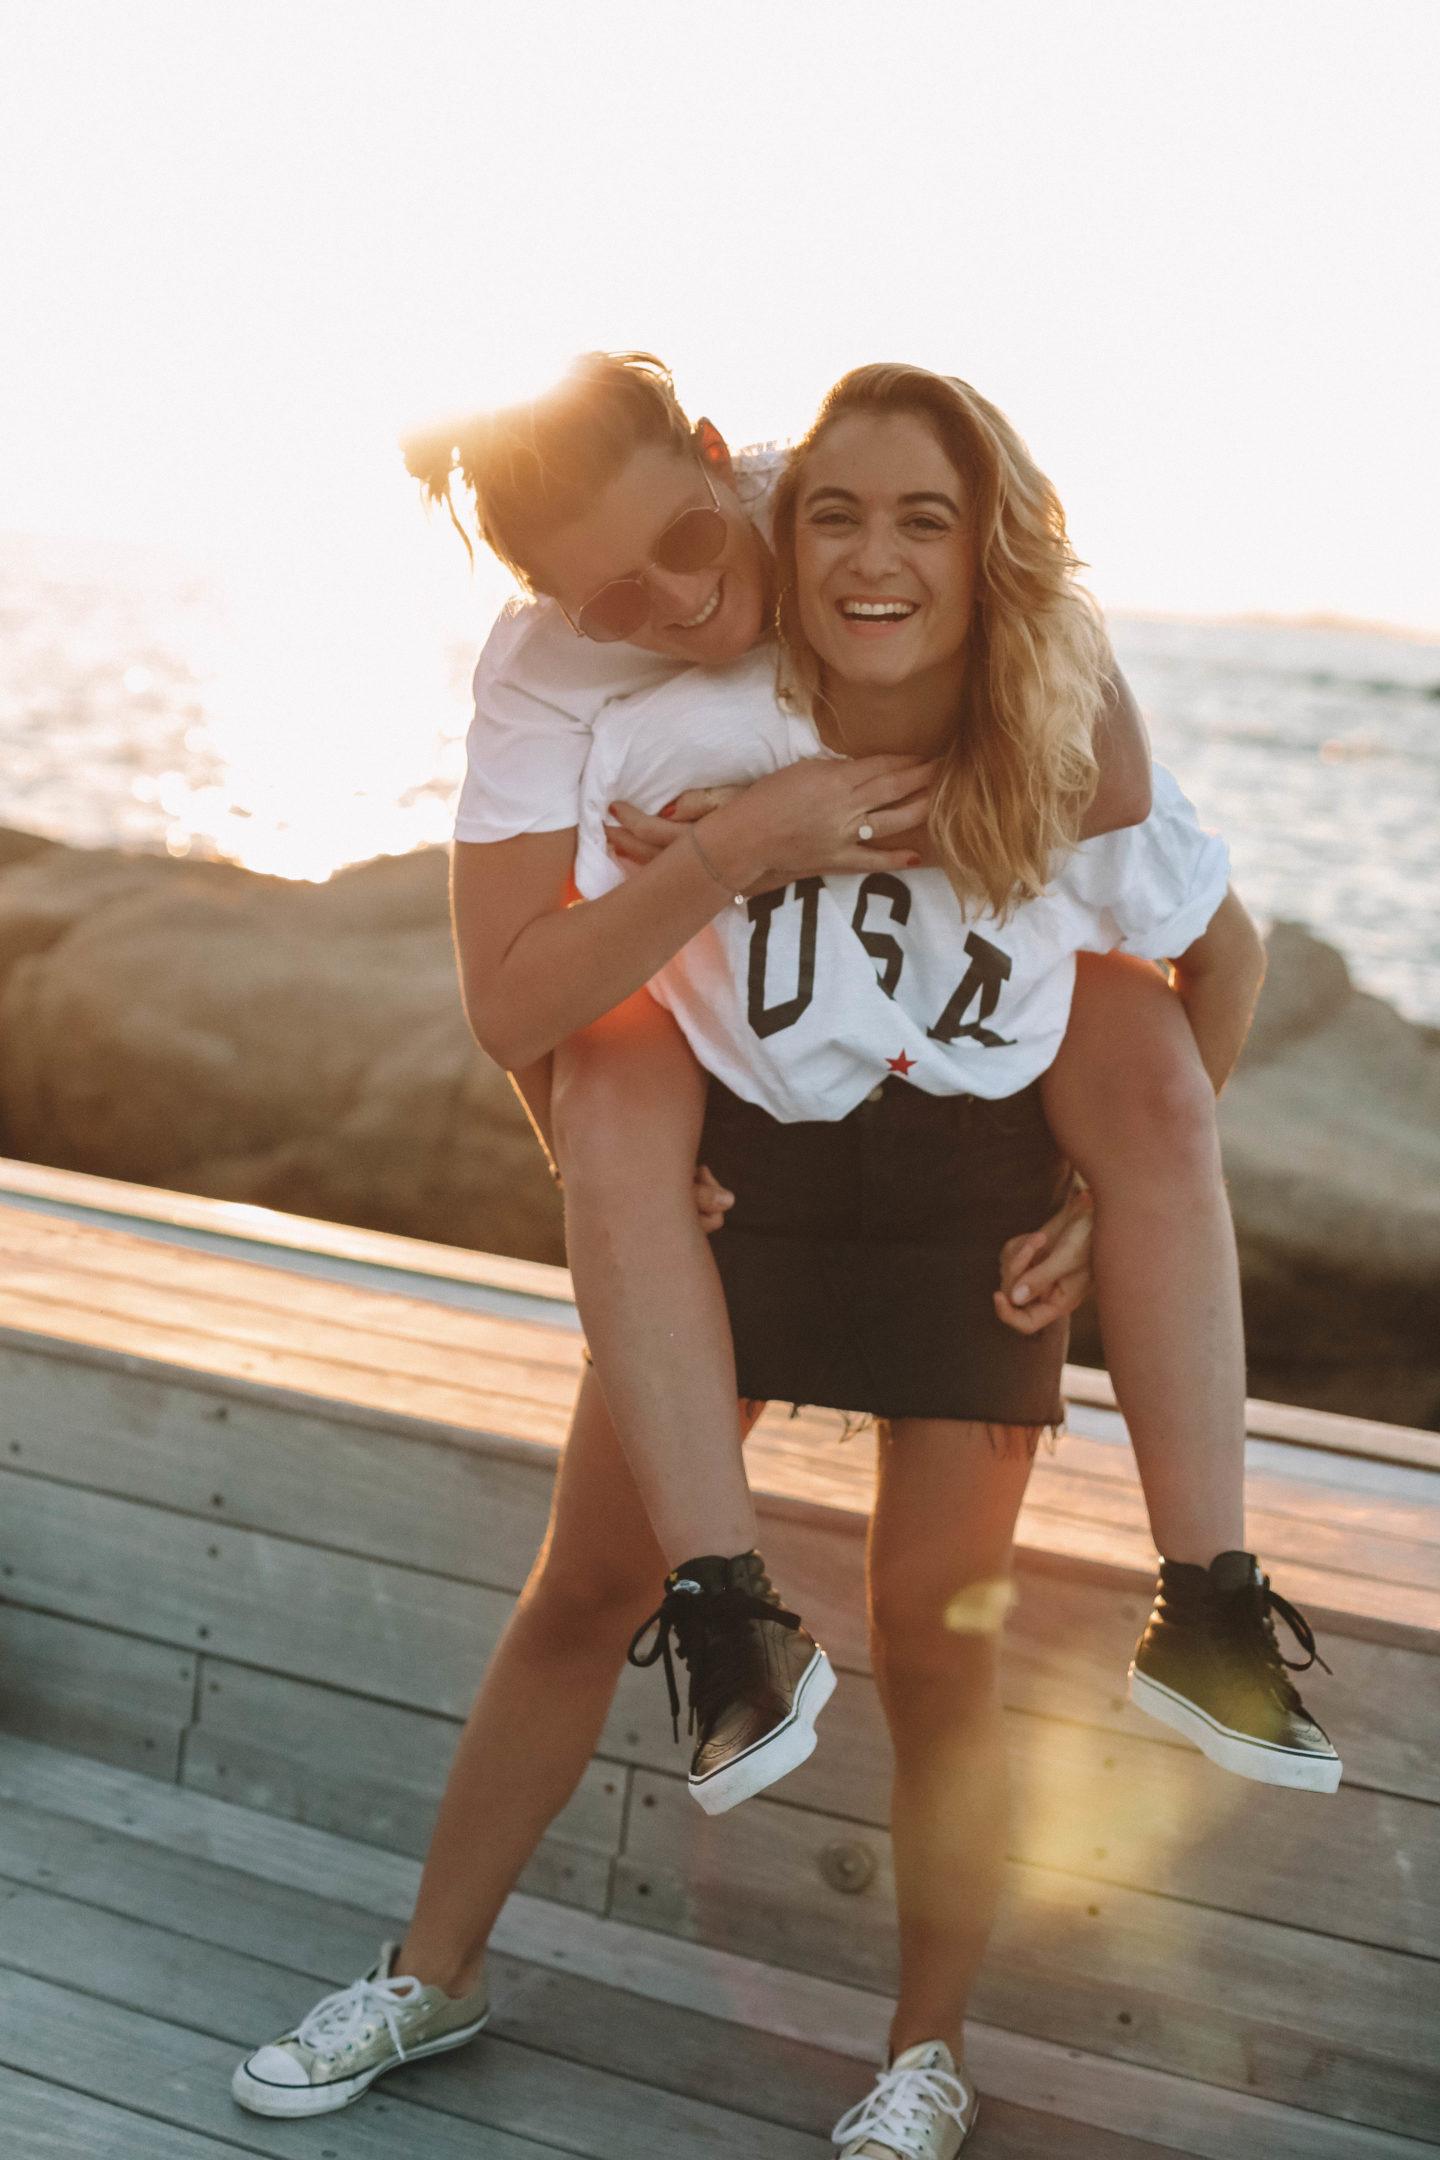 Sourires - Blondie baby blog mode et voyages